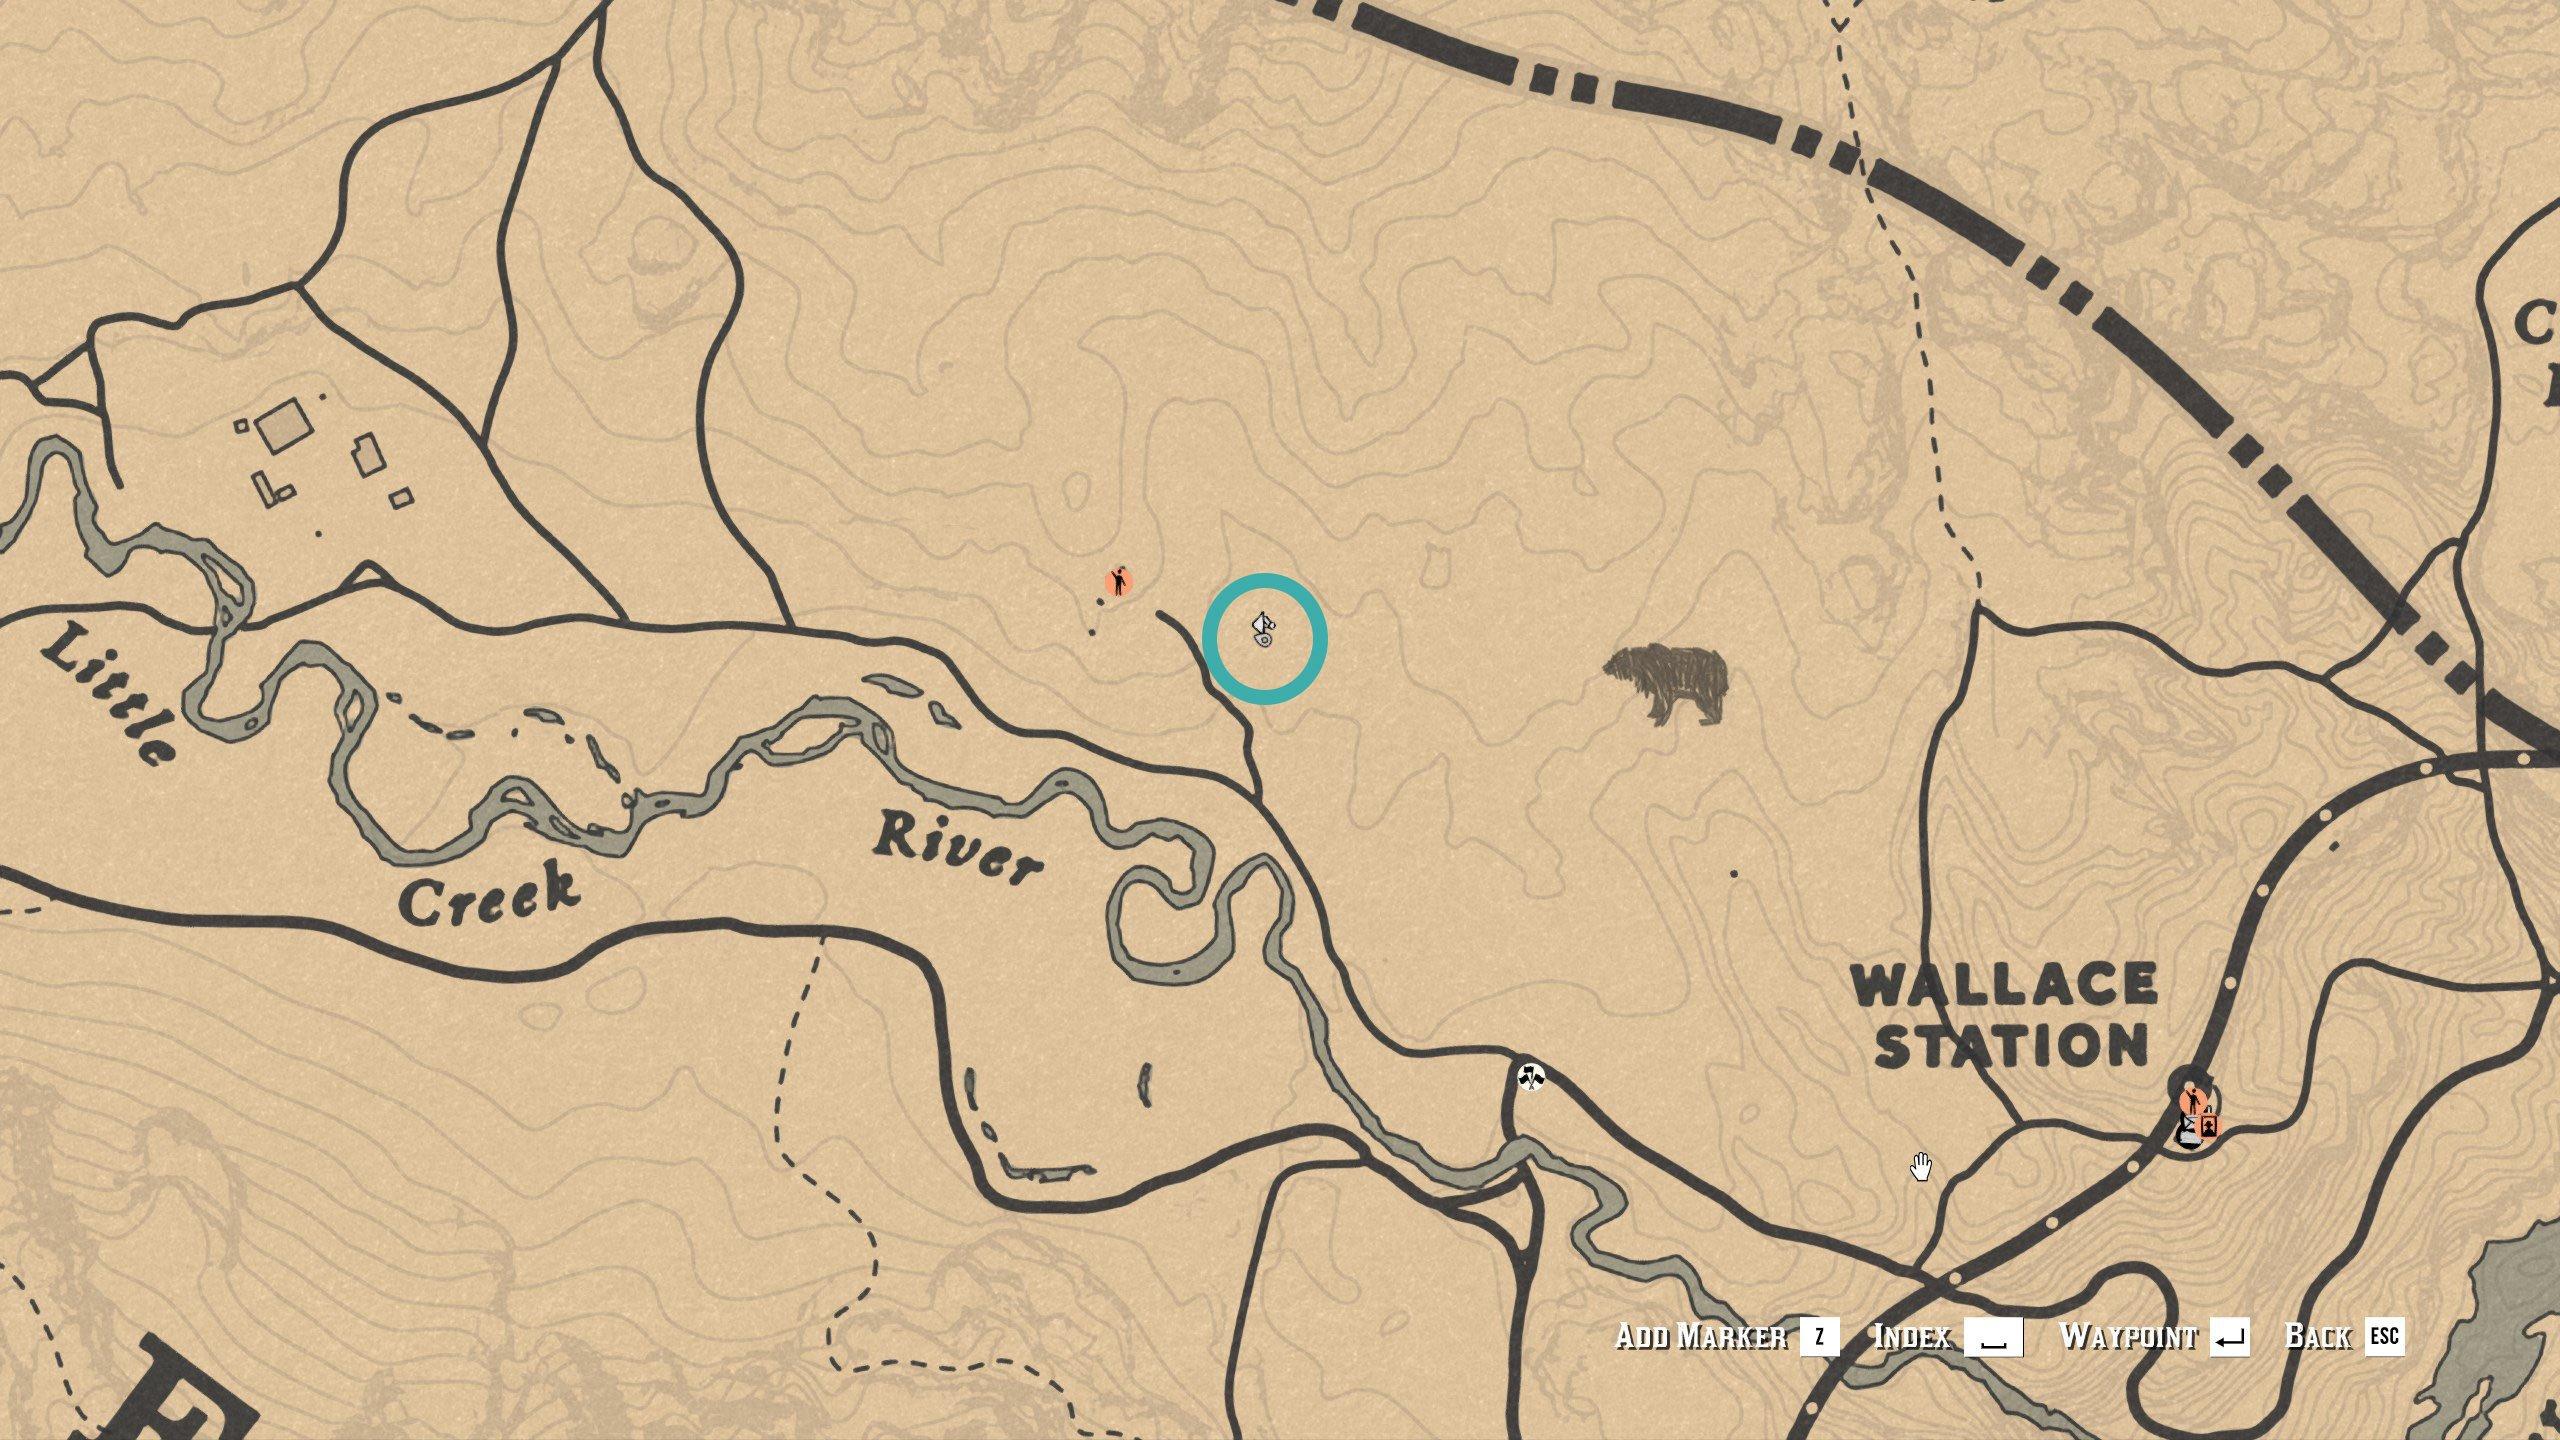 East Watsons Treasure Map location 1